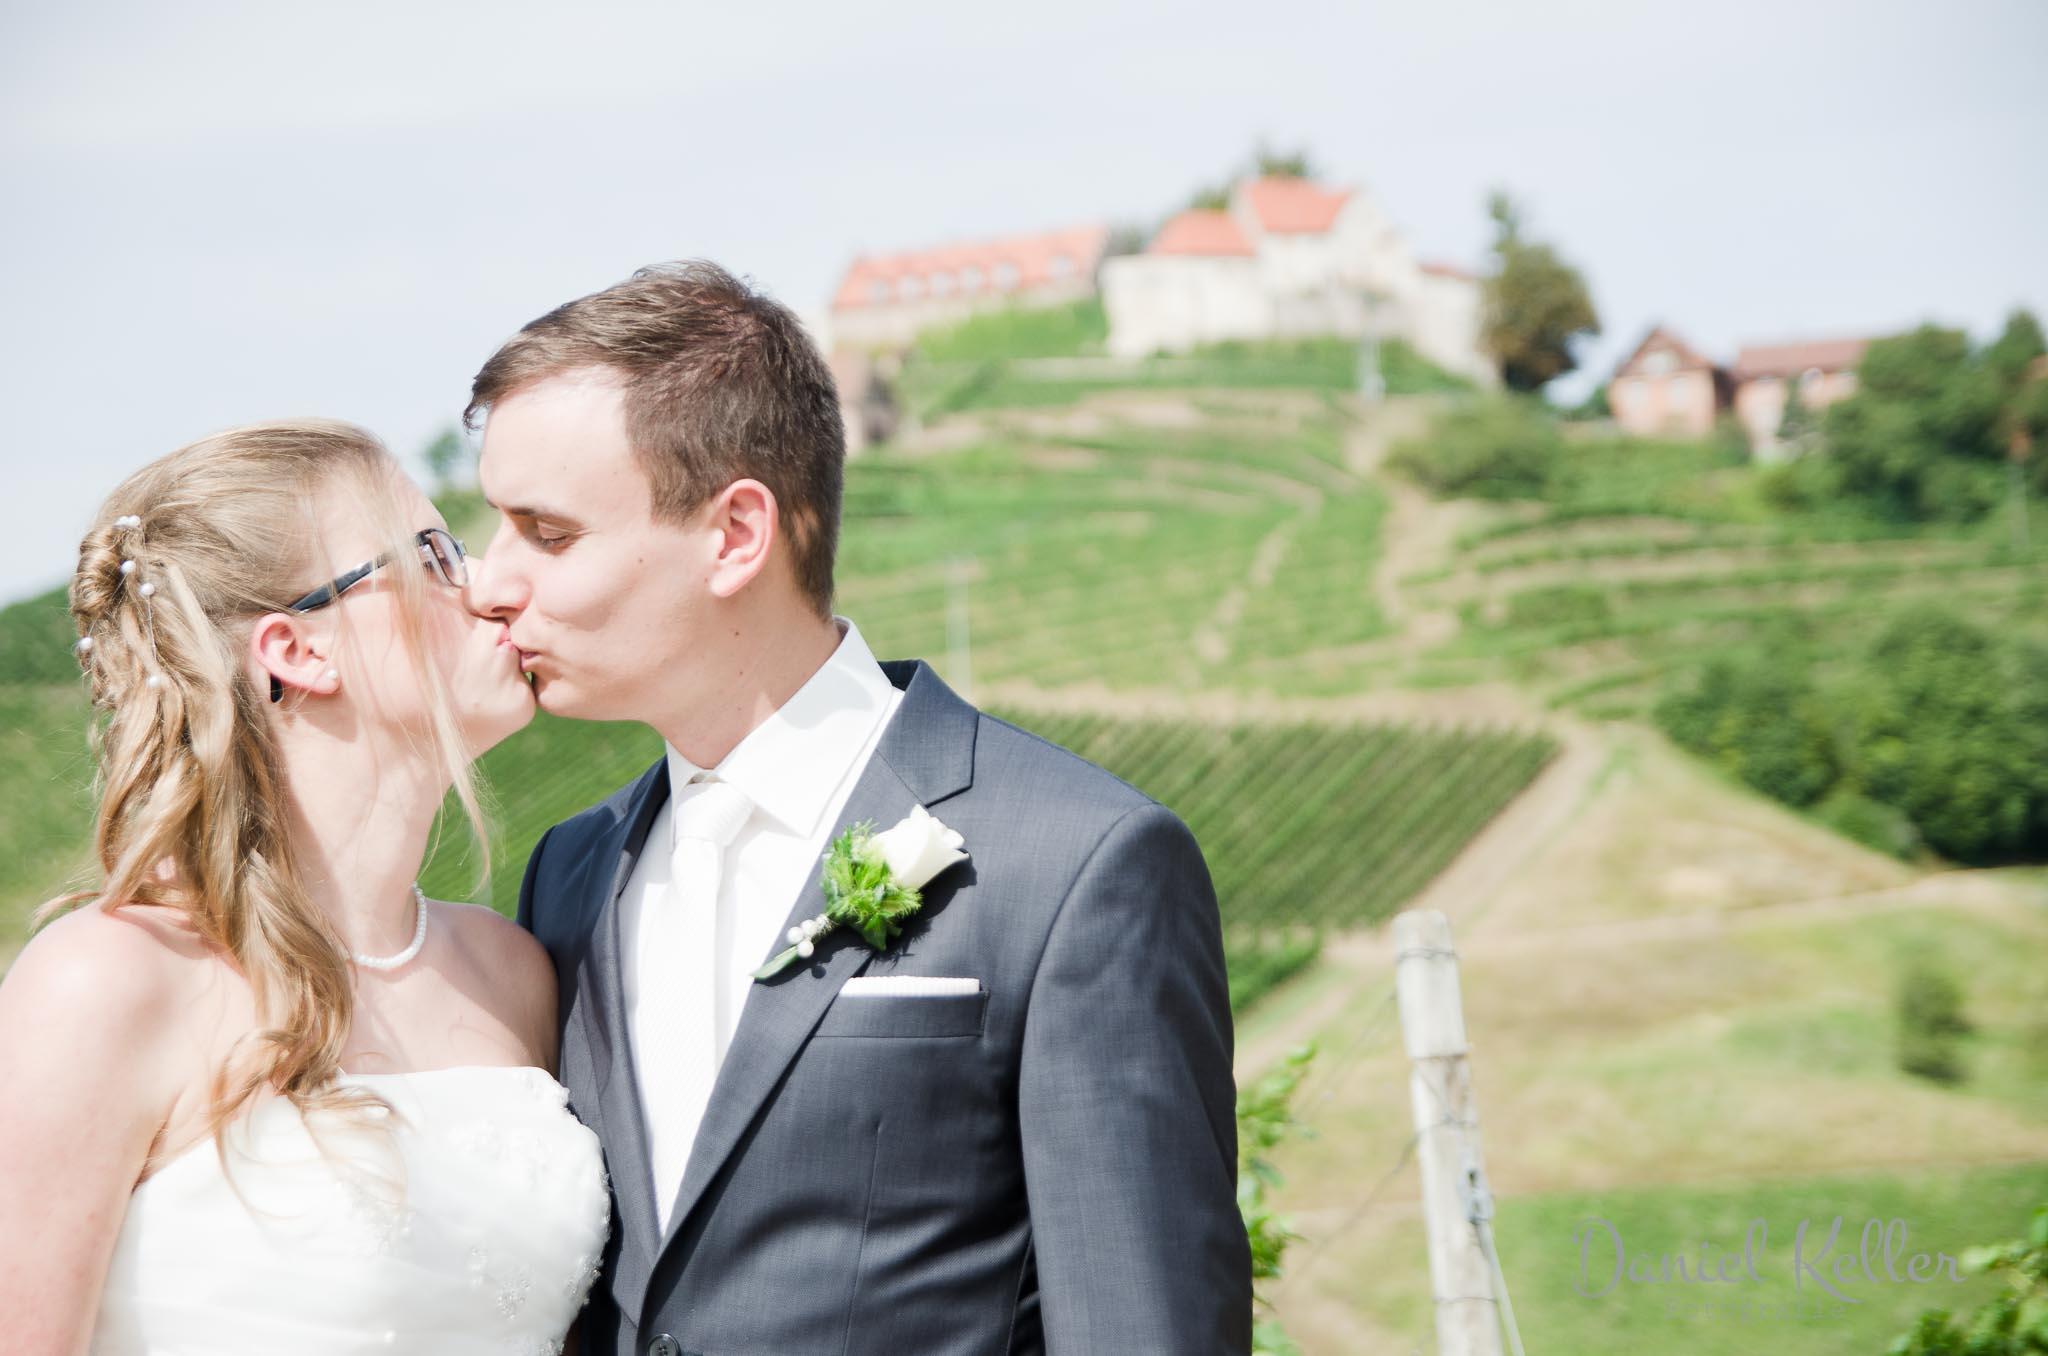 Hochzeitsfotograf Ortenau Daniel Keller Schloss Staufenberg